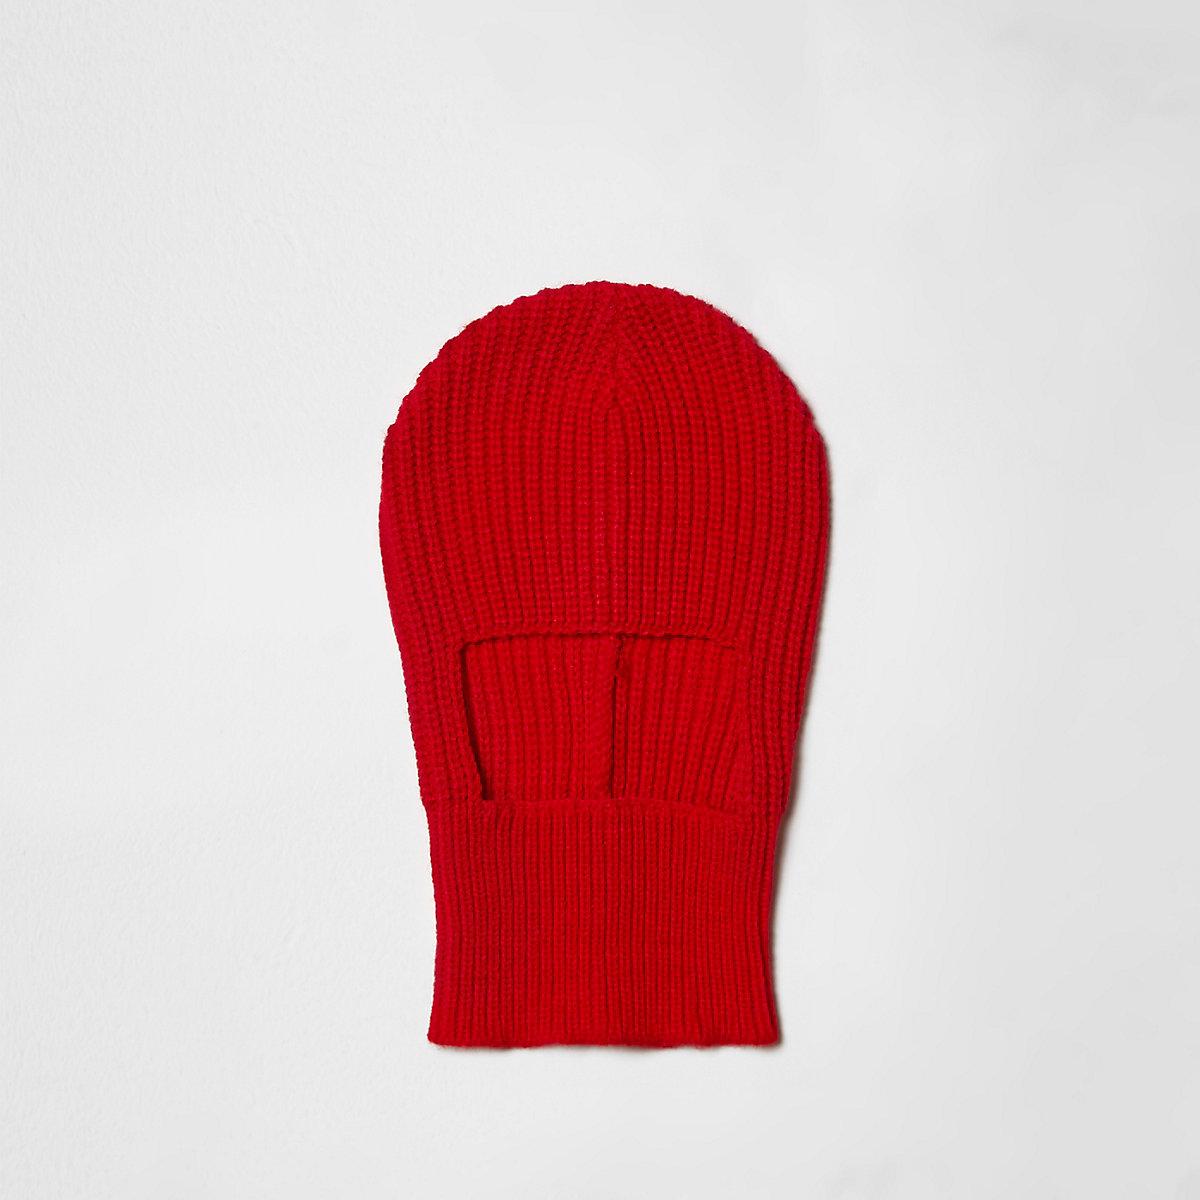 Red rib knit balaclava